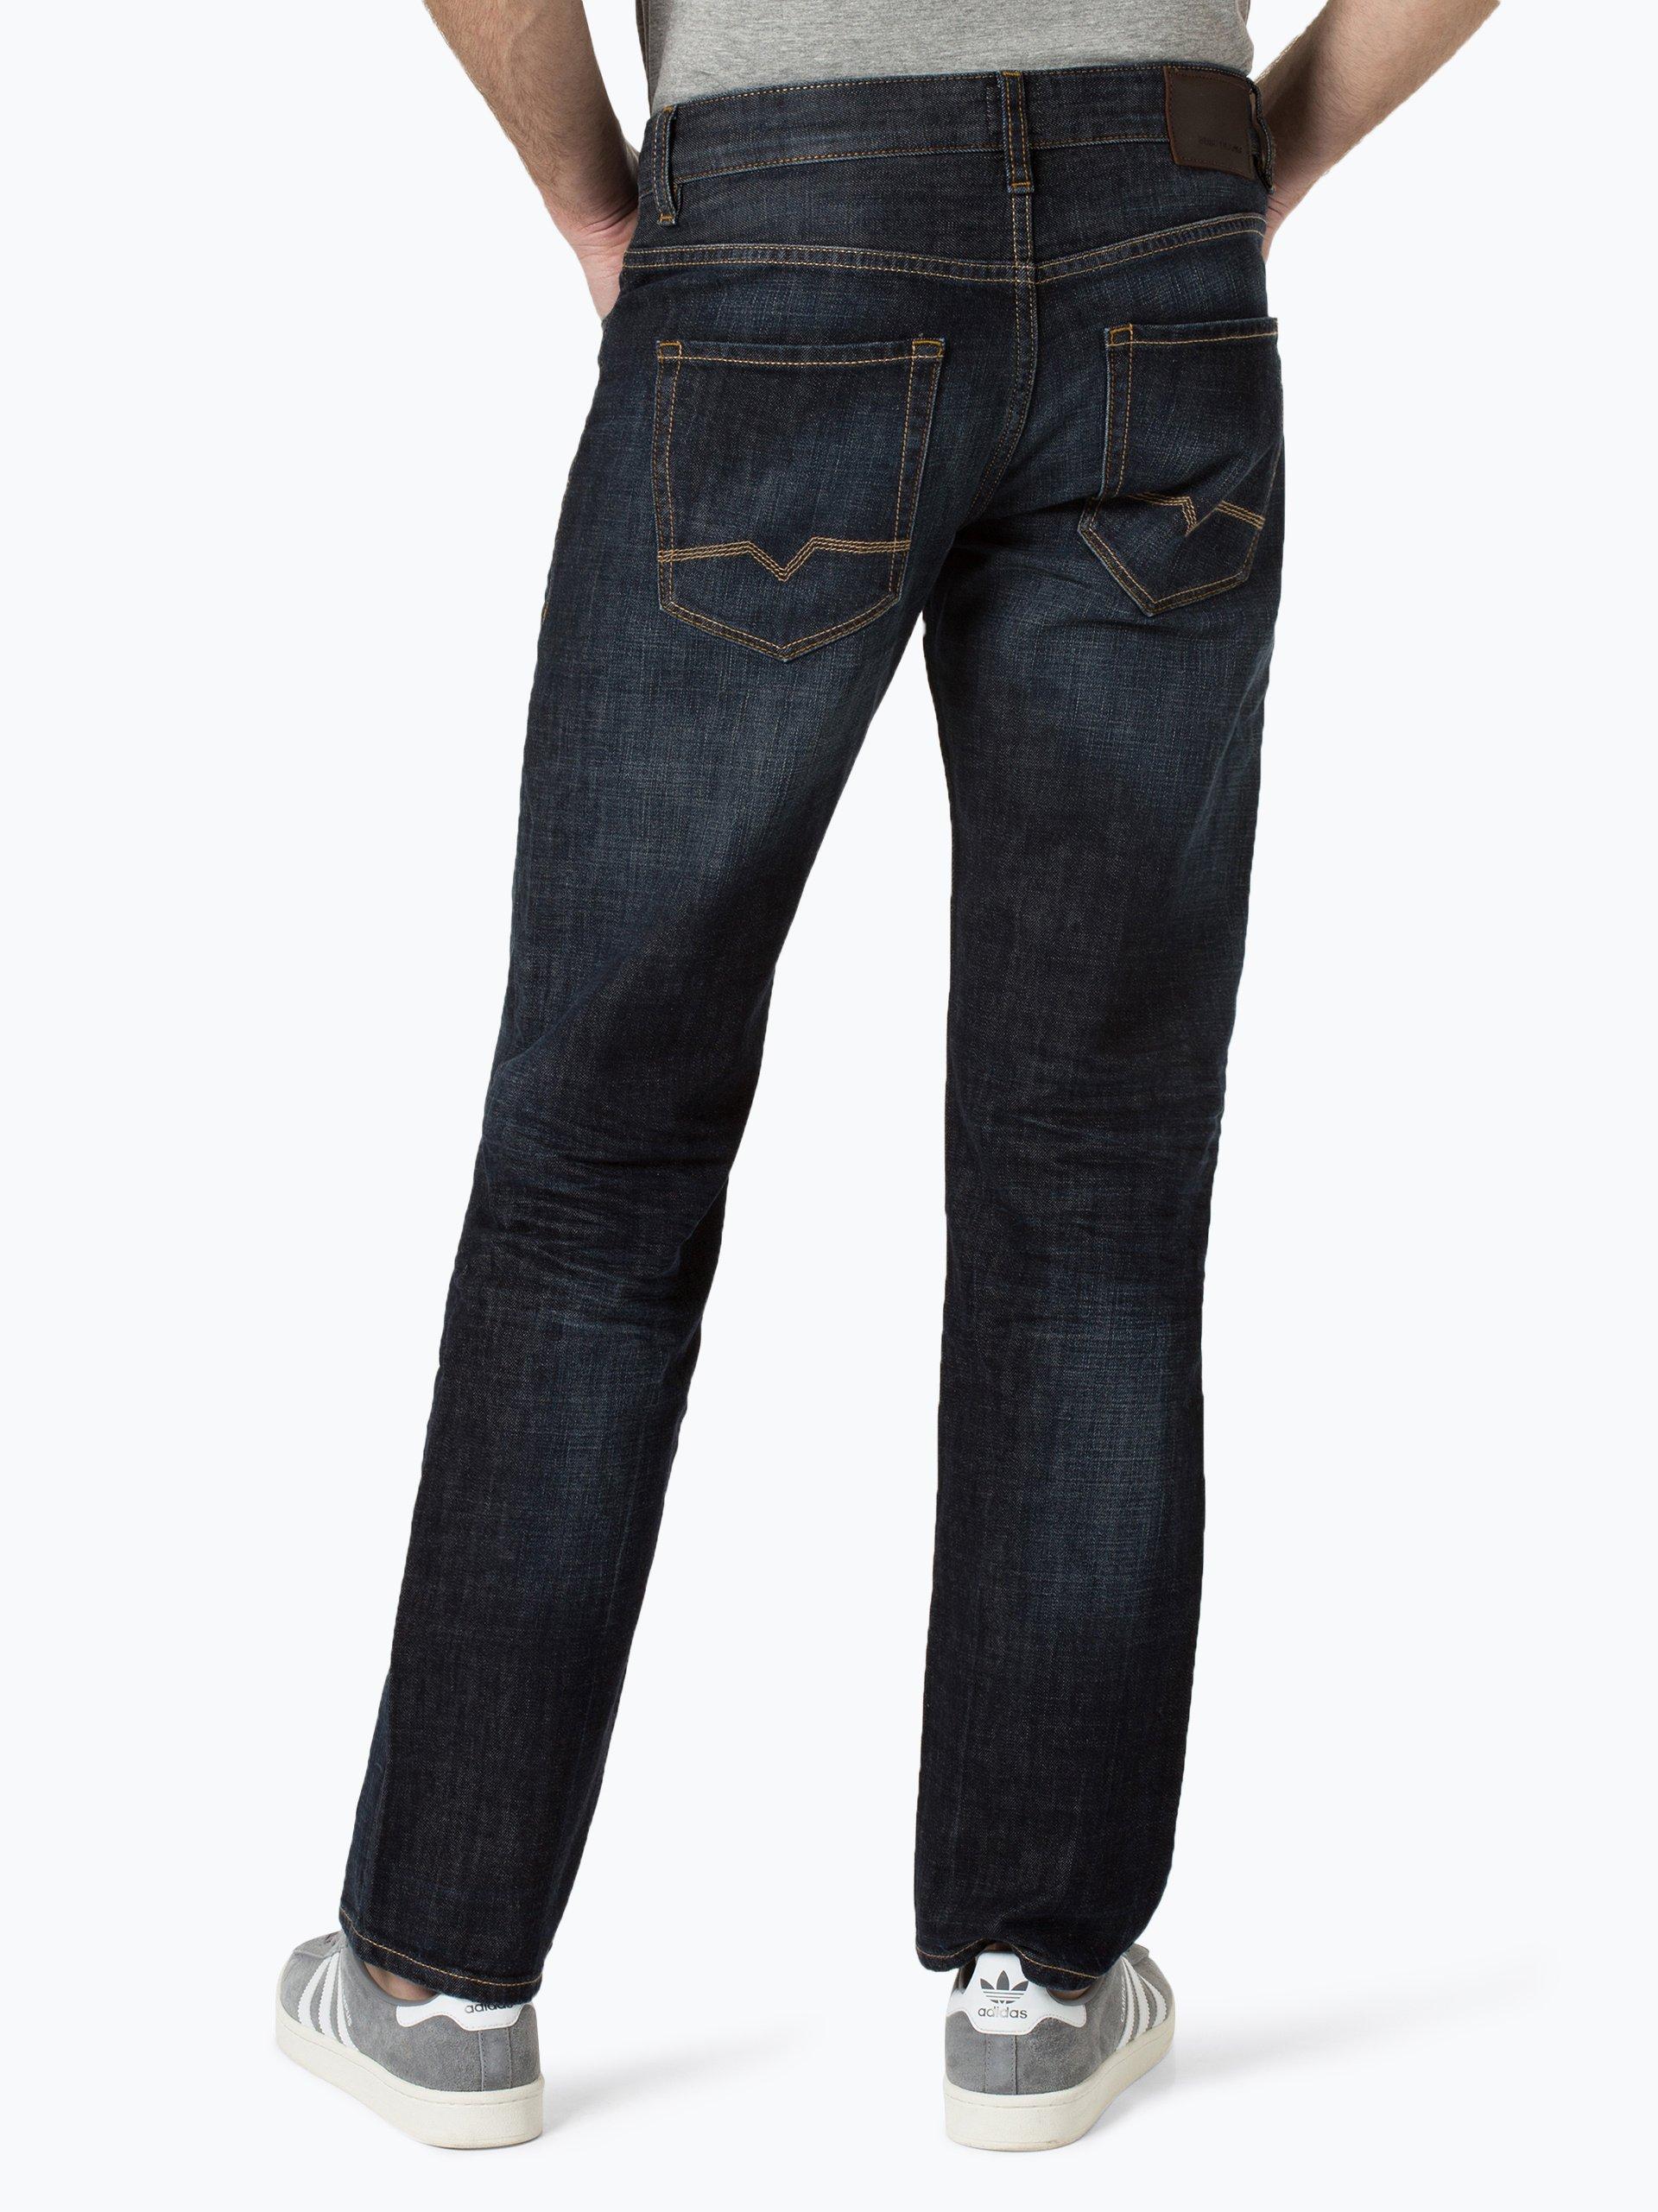 boss casual herren jeans orange25 dark stone blau uni online kaufen vangraaf com. Black Bedroom Furniture Sets. Home Design Ideas